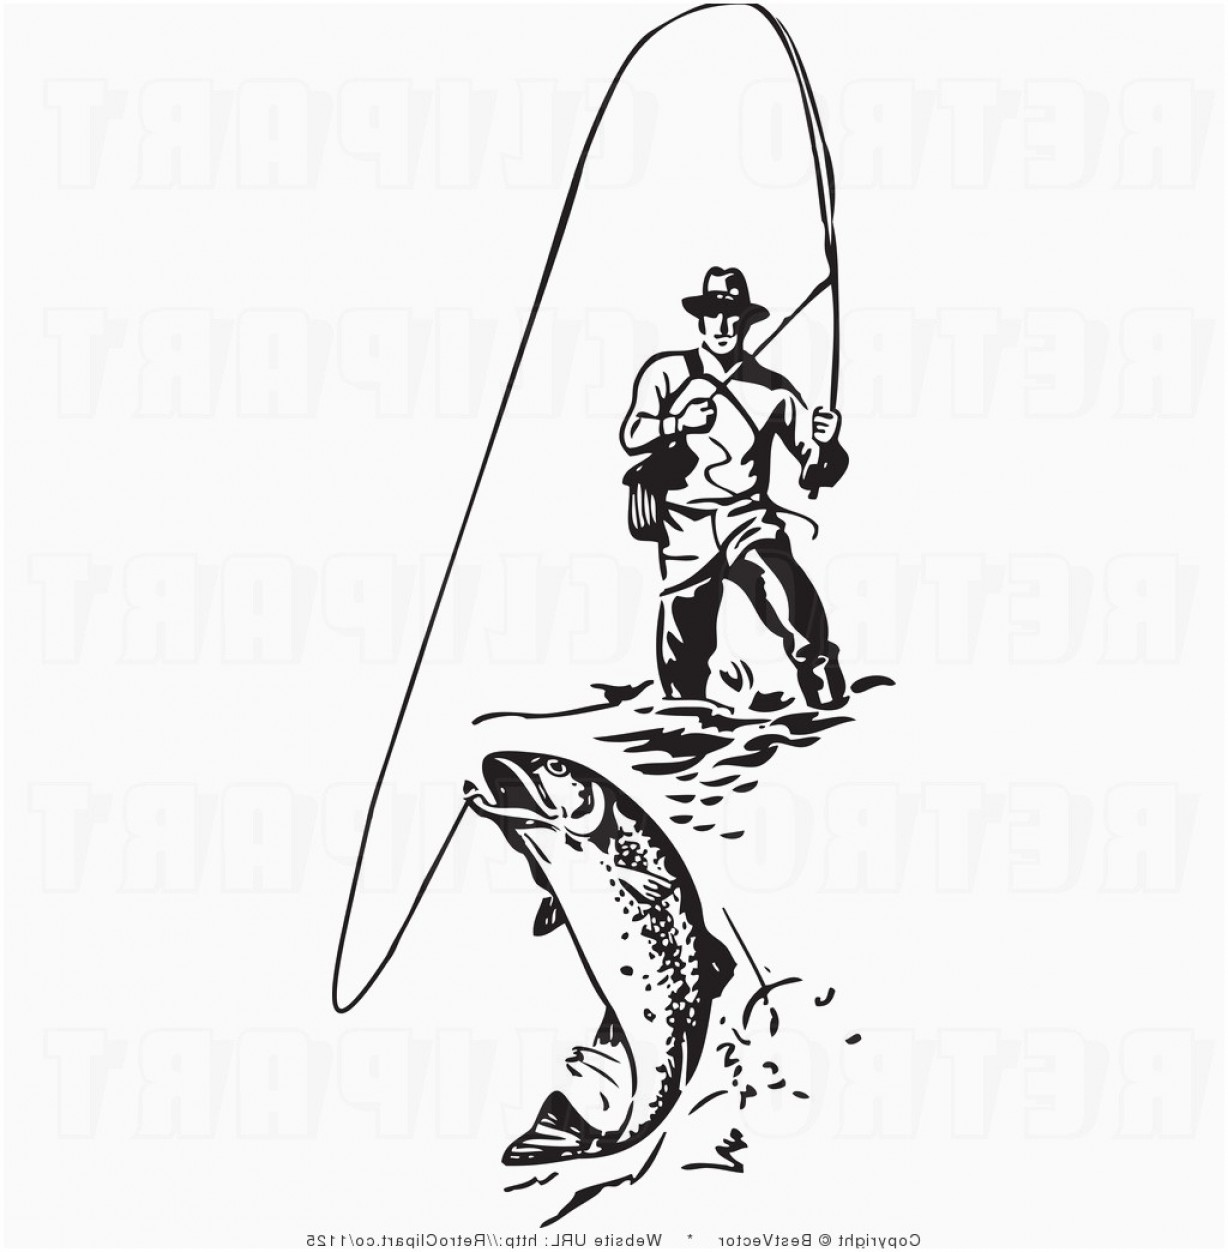 Free Fly Fishing Clipart Elegant Fly Fishing Clip Art Free.